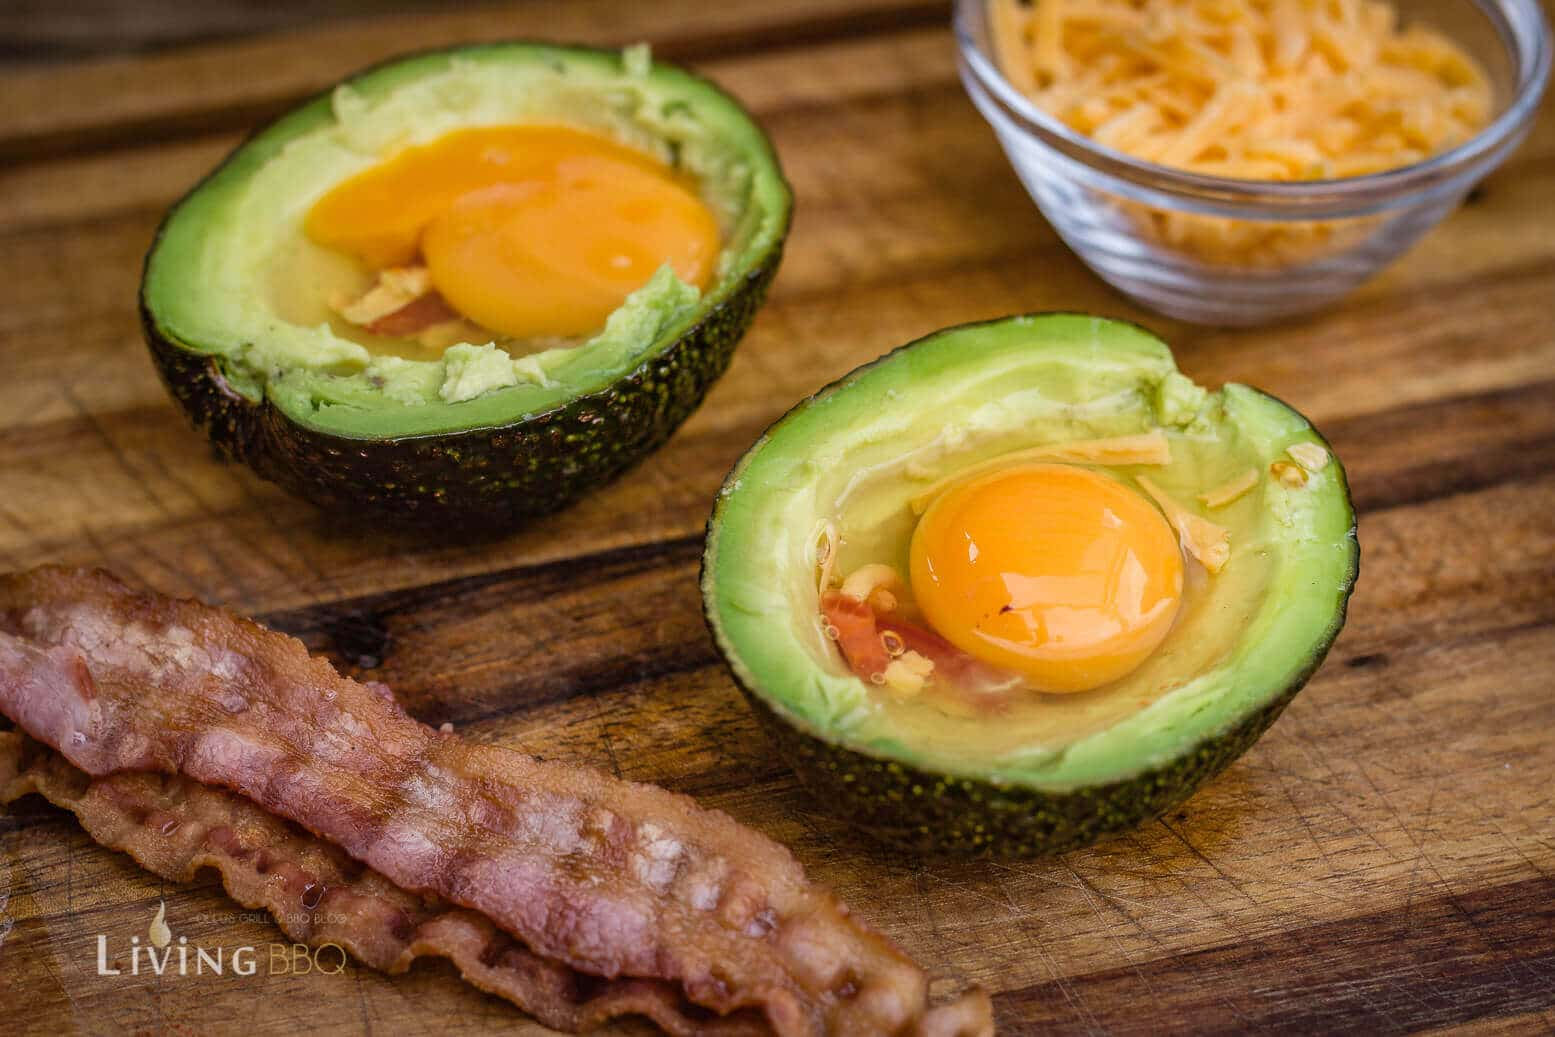 Avocado Rezept Ei Bacon Frühstück avocado_Avocado Rezept Ei Bacon Fru  hstu  ck 6 von 44